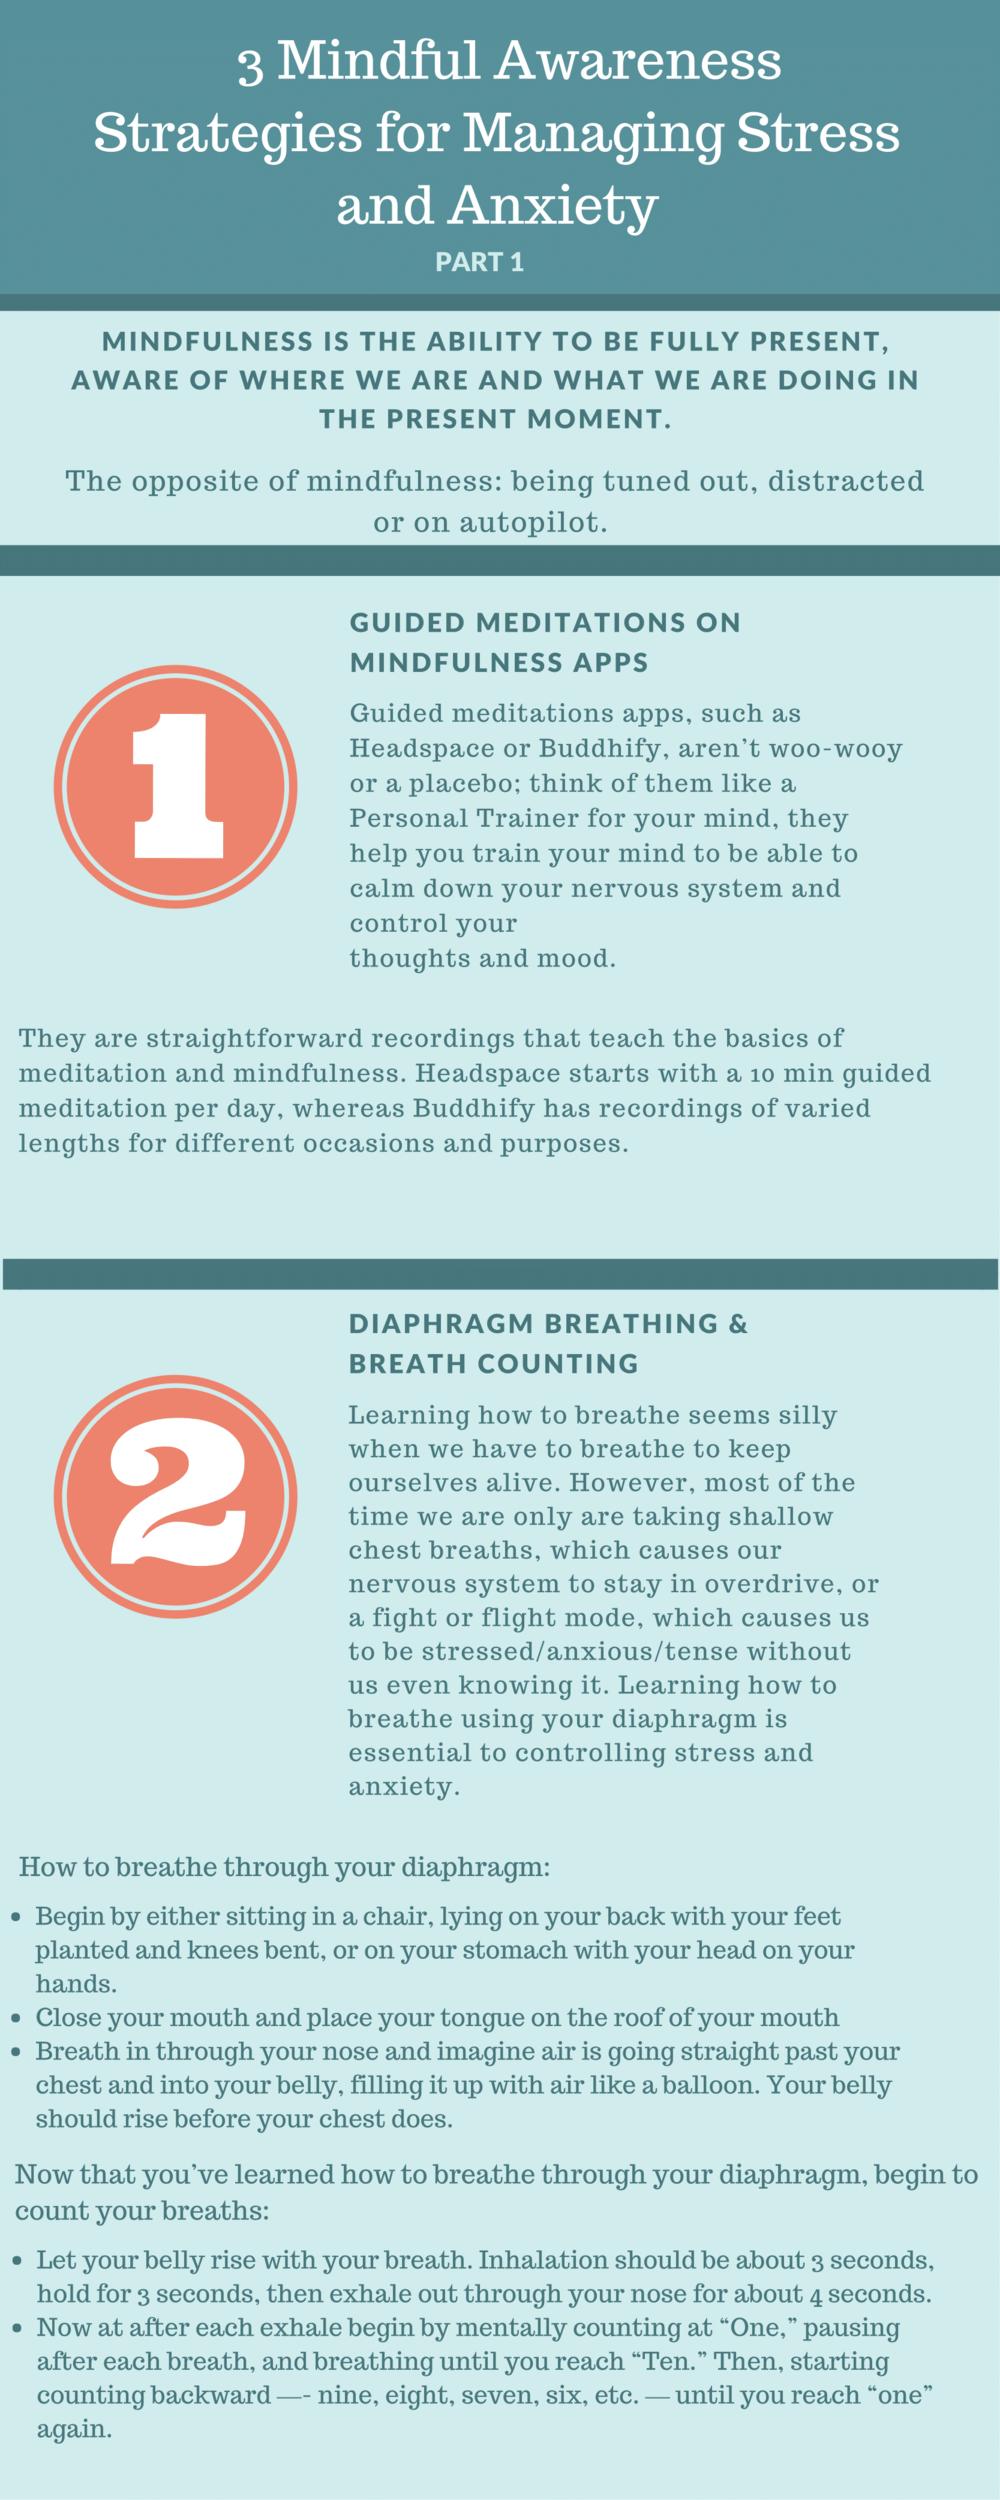 3 Mindful Awareness Strategies PDF-1.png